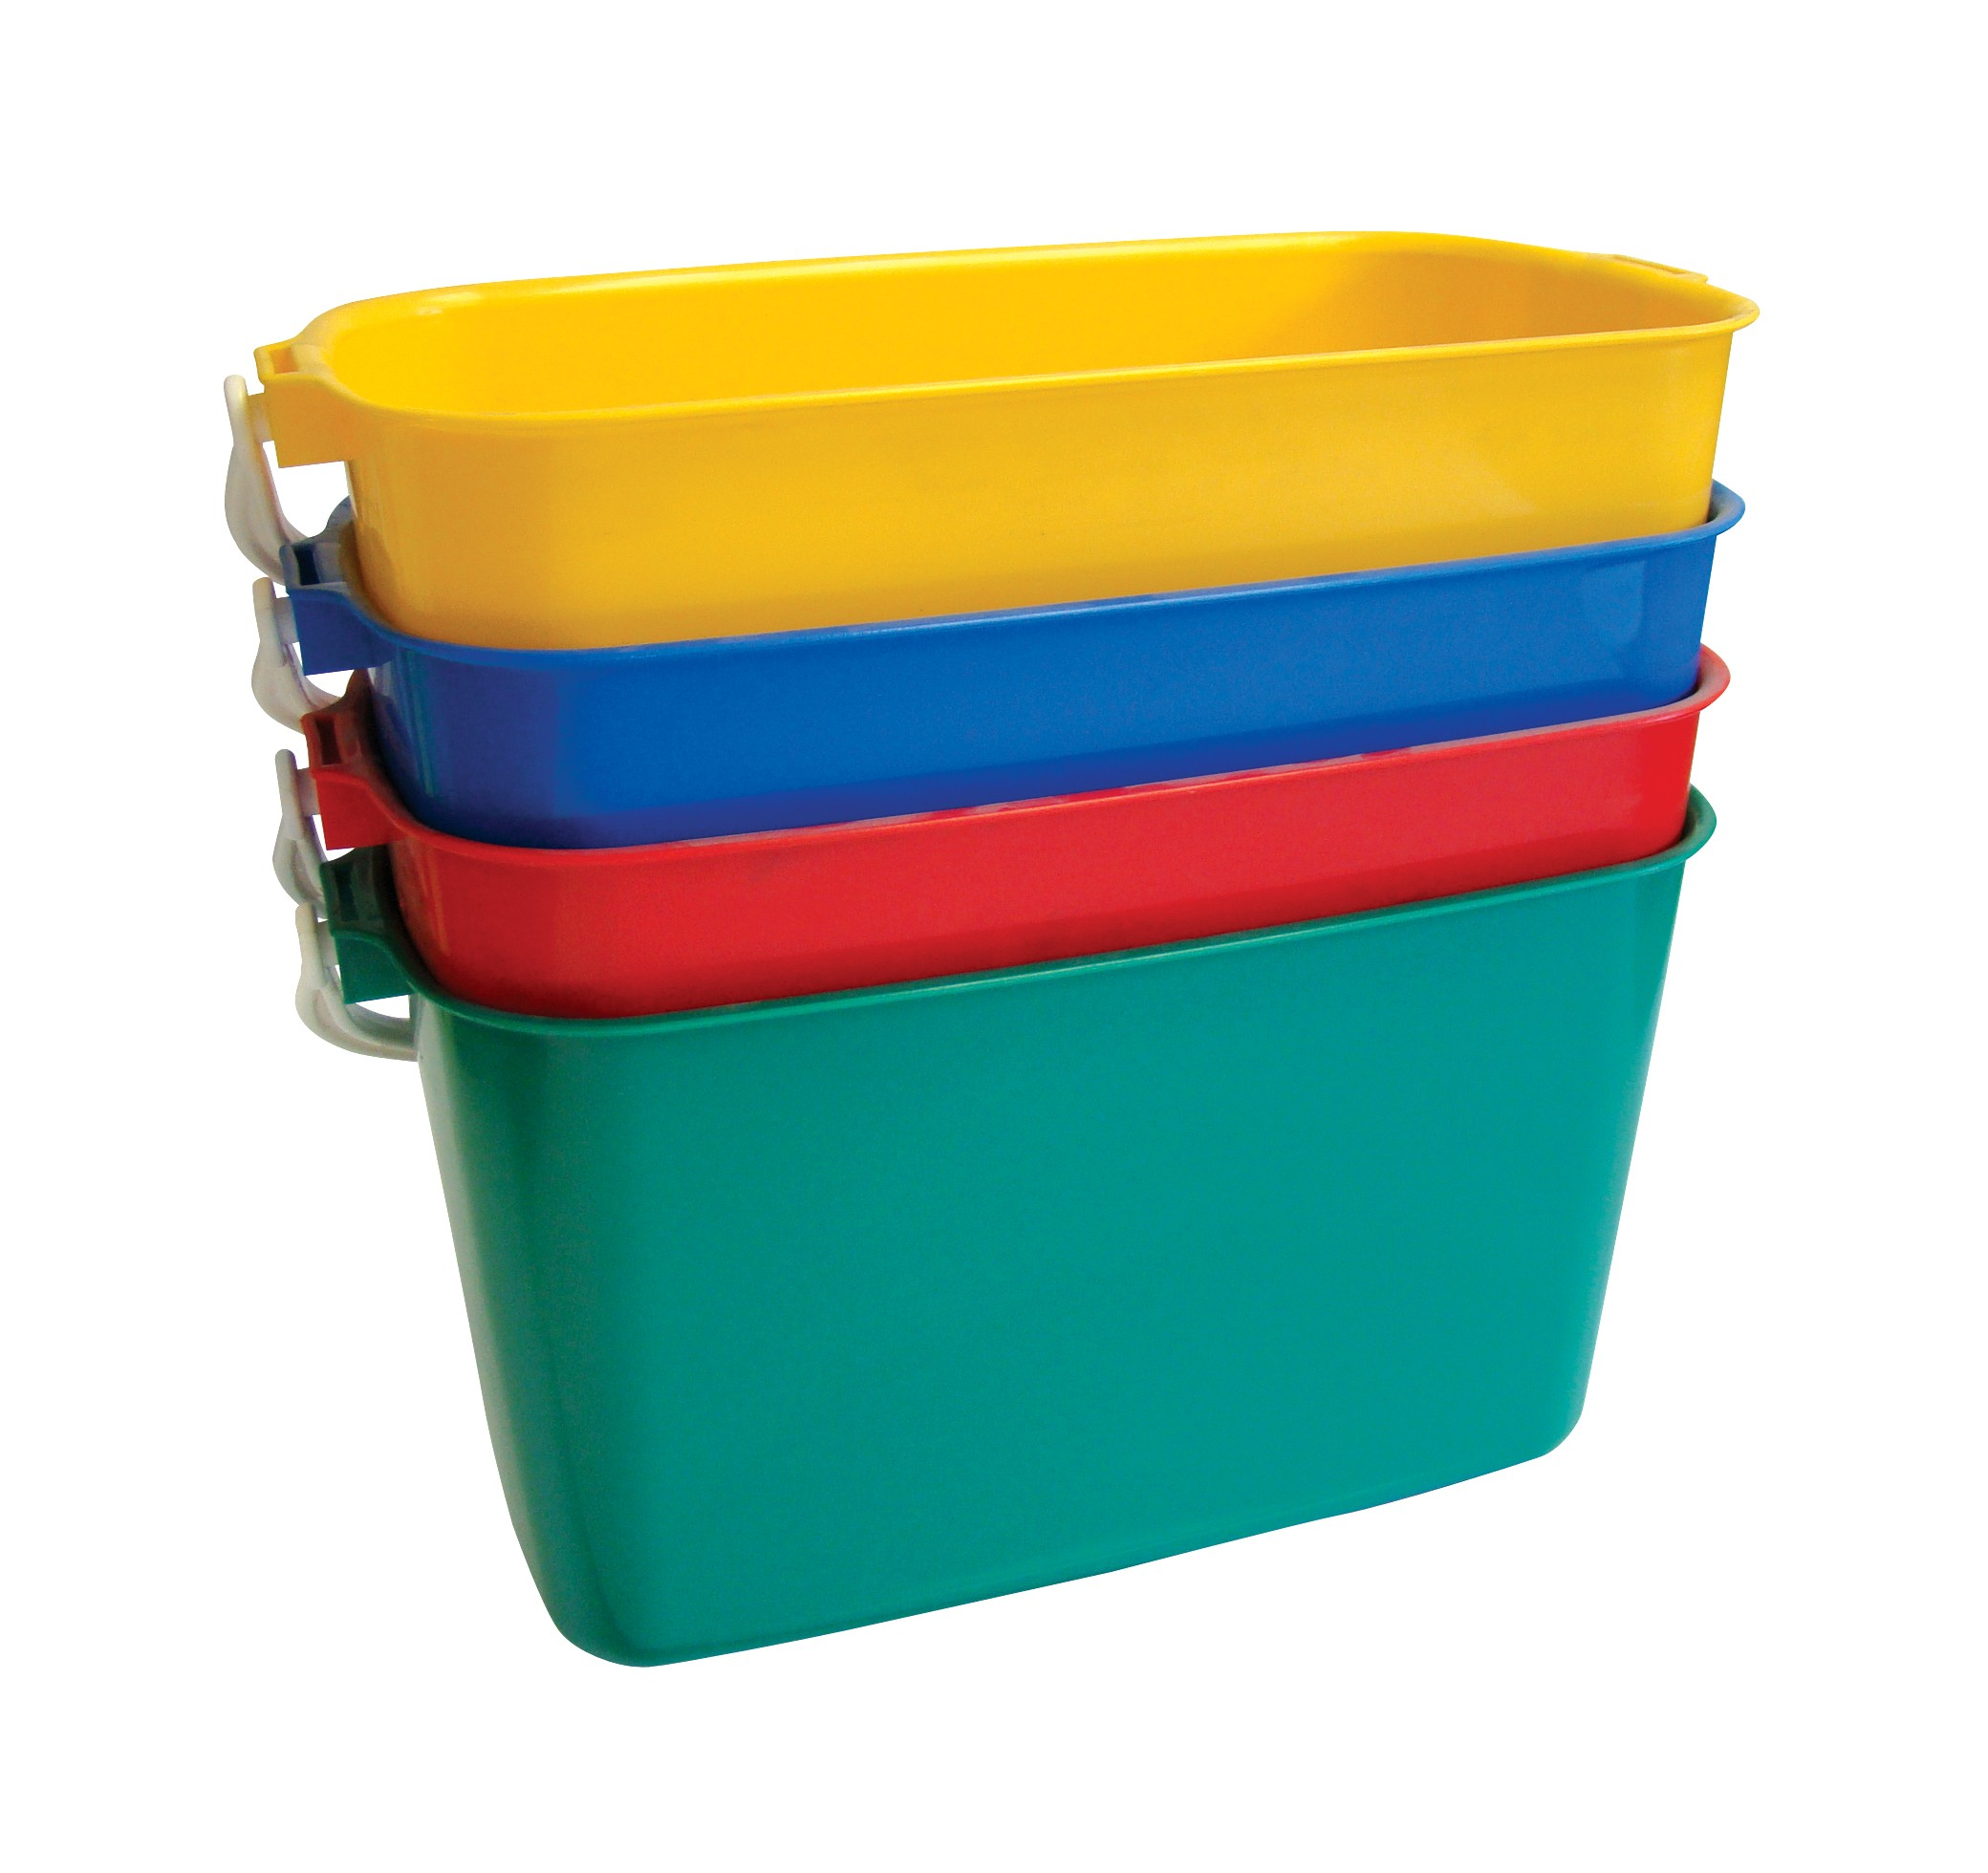 9ltr Rectangular Colour Coded Buckets